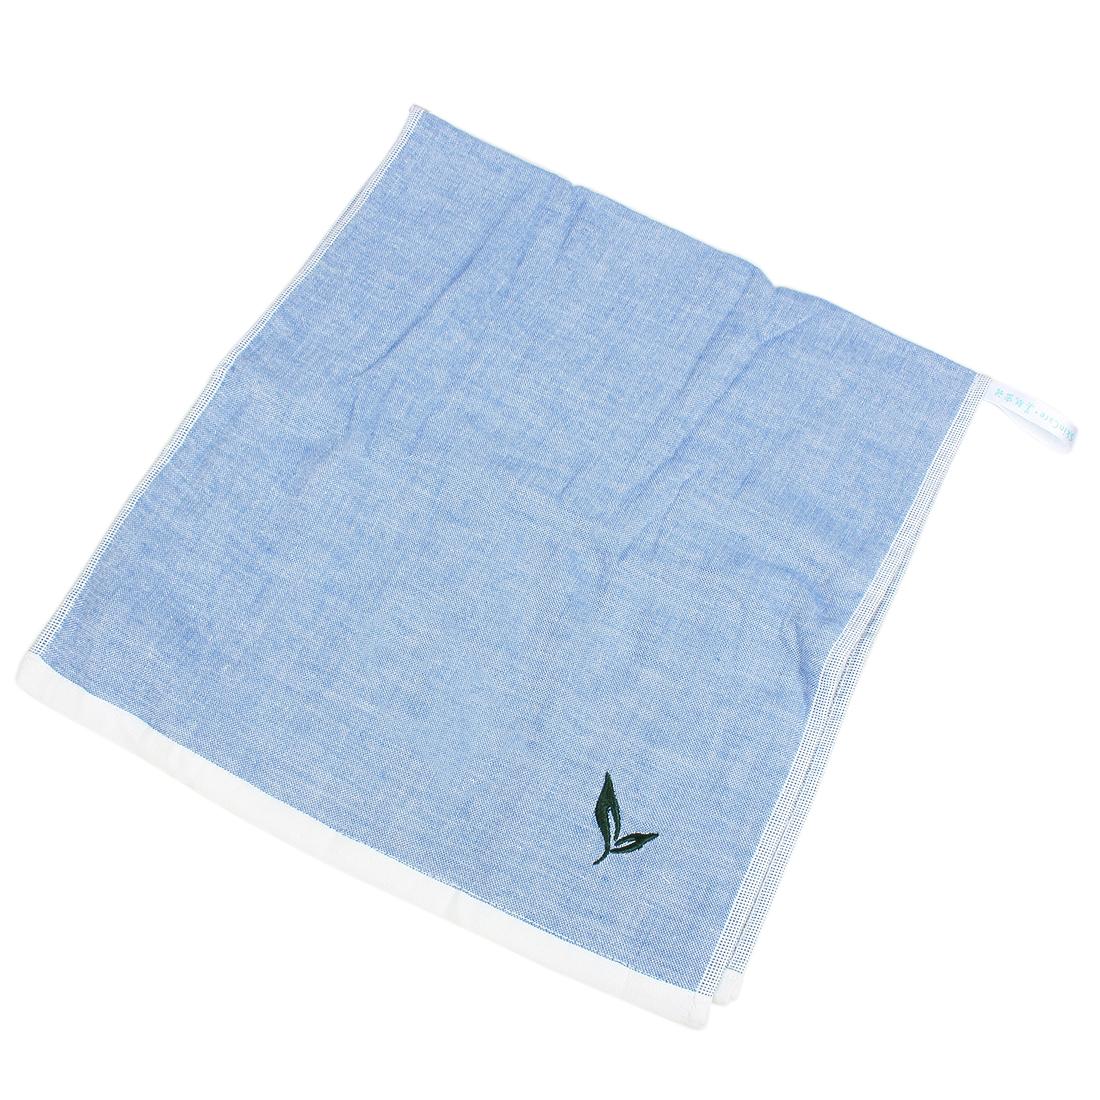 Green Tea Flavor Facecloth Towel 35 x 74cm Sky Blue